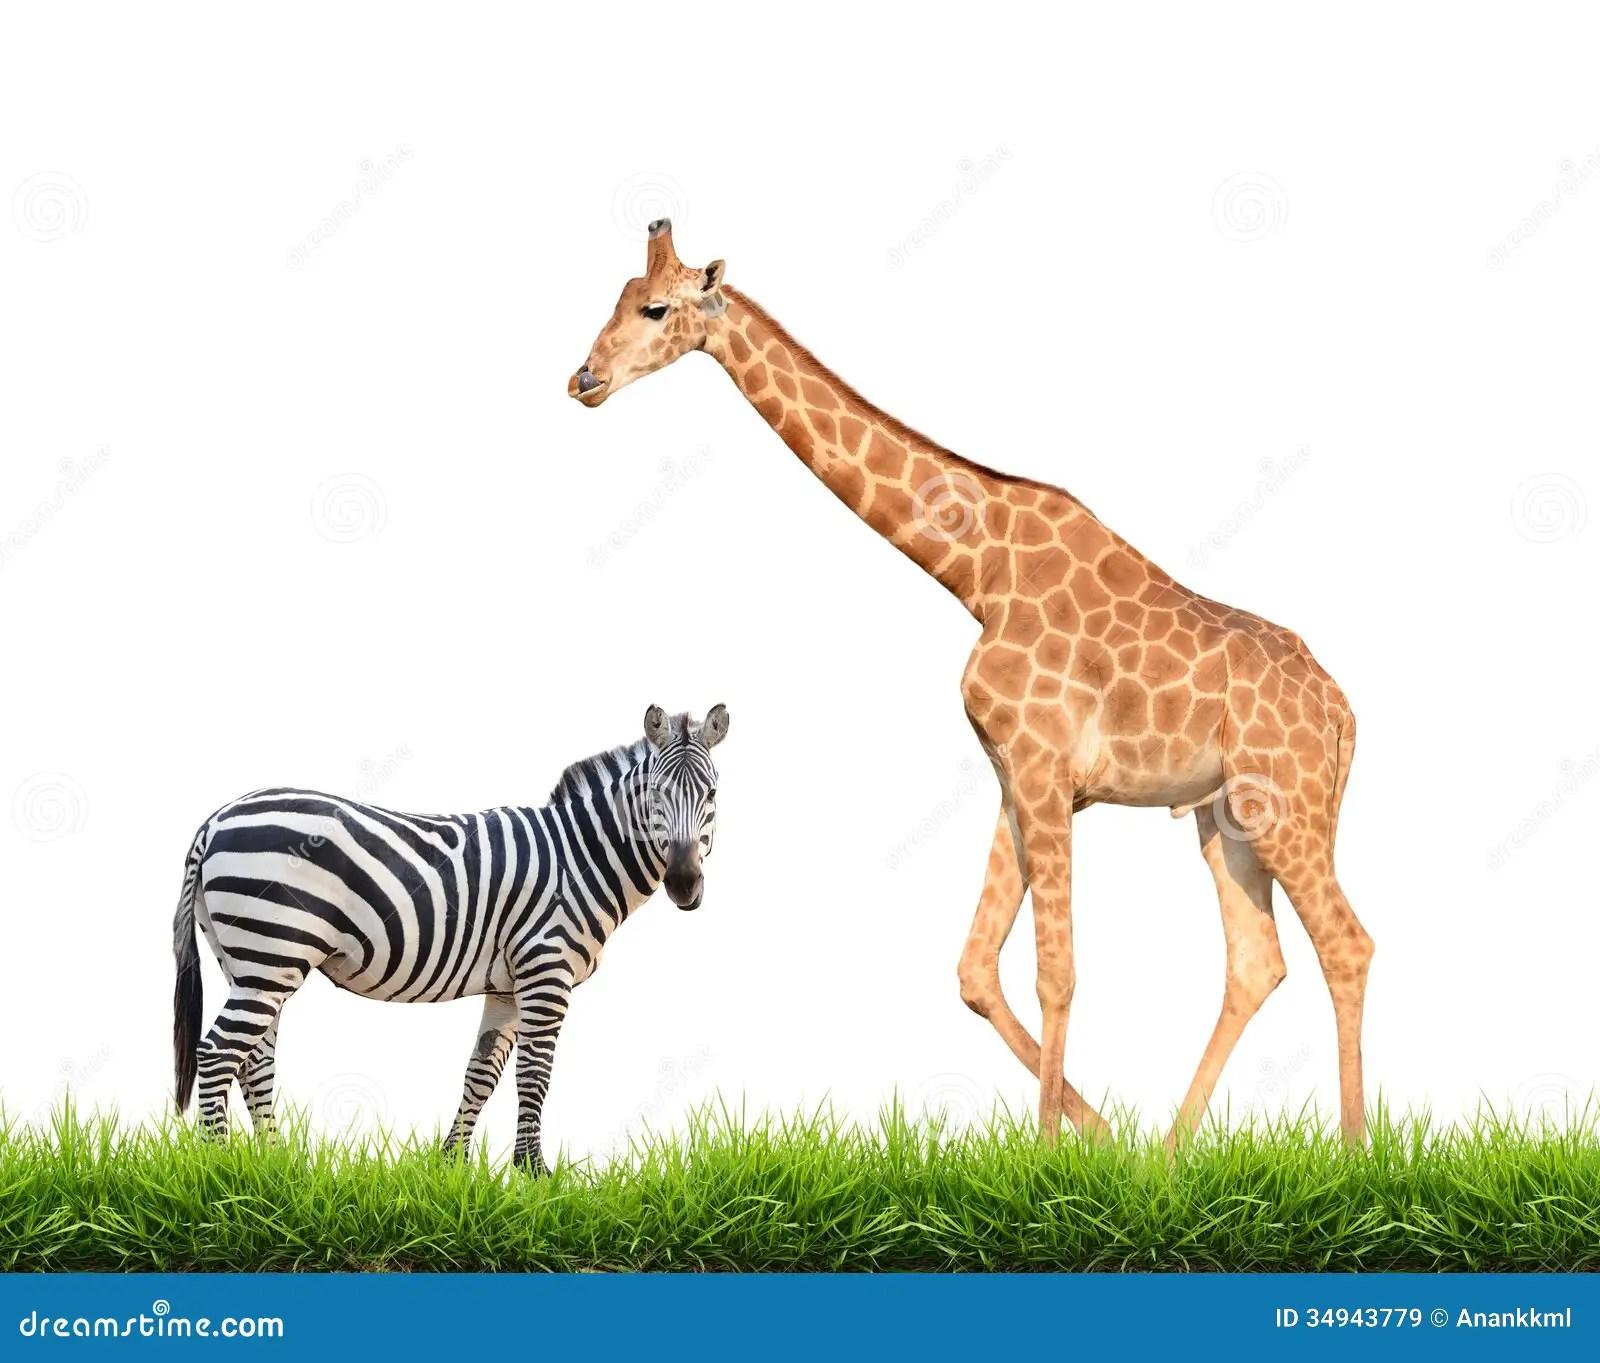 Zebra Giraffe With Green Grass Isolated Royalty Free Stock